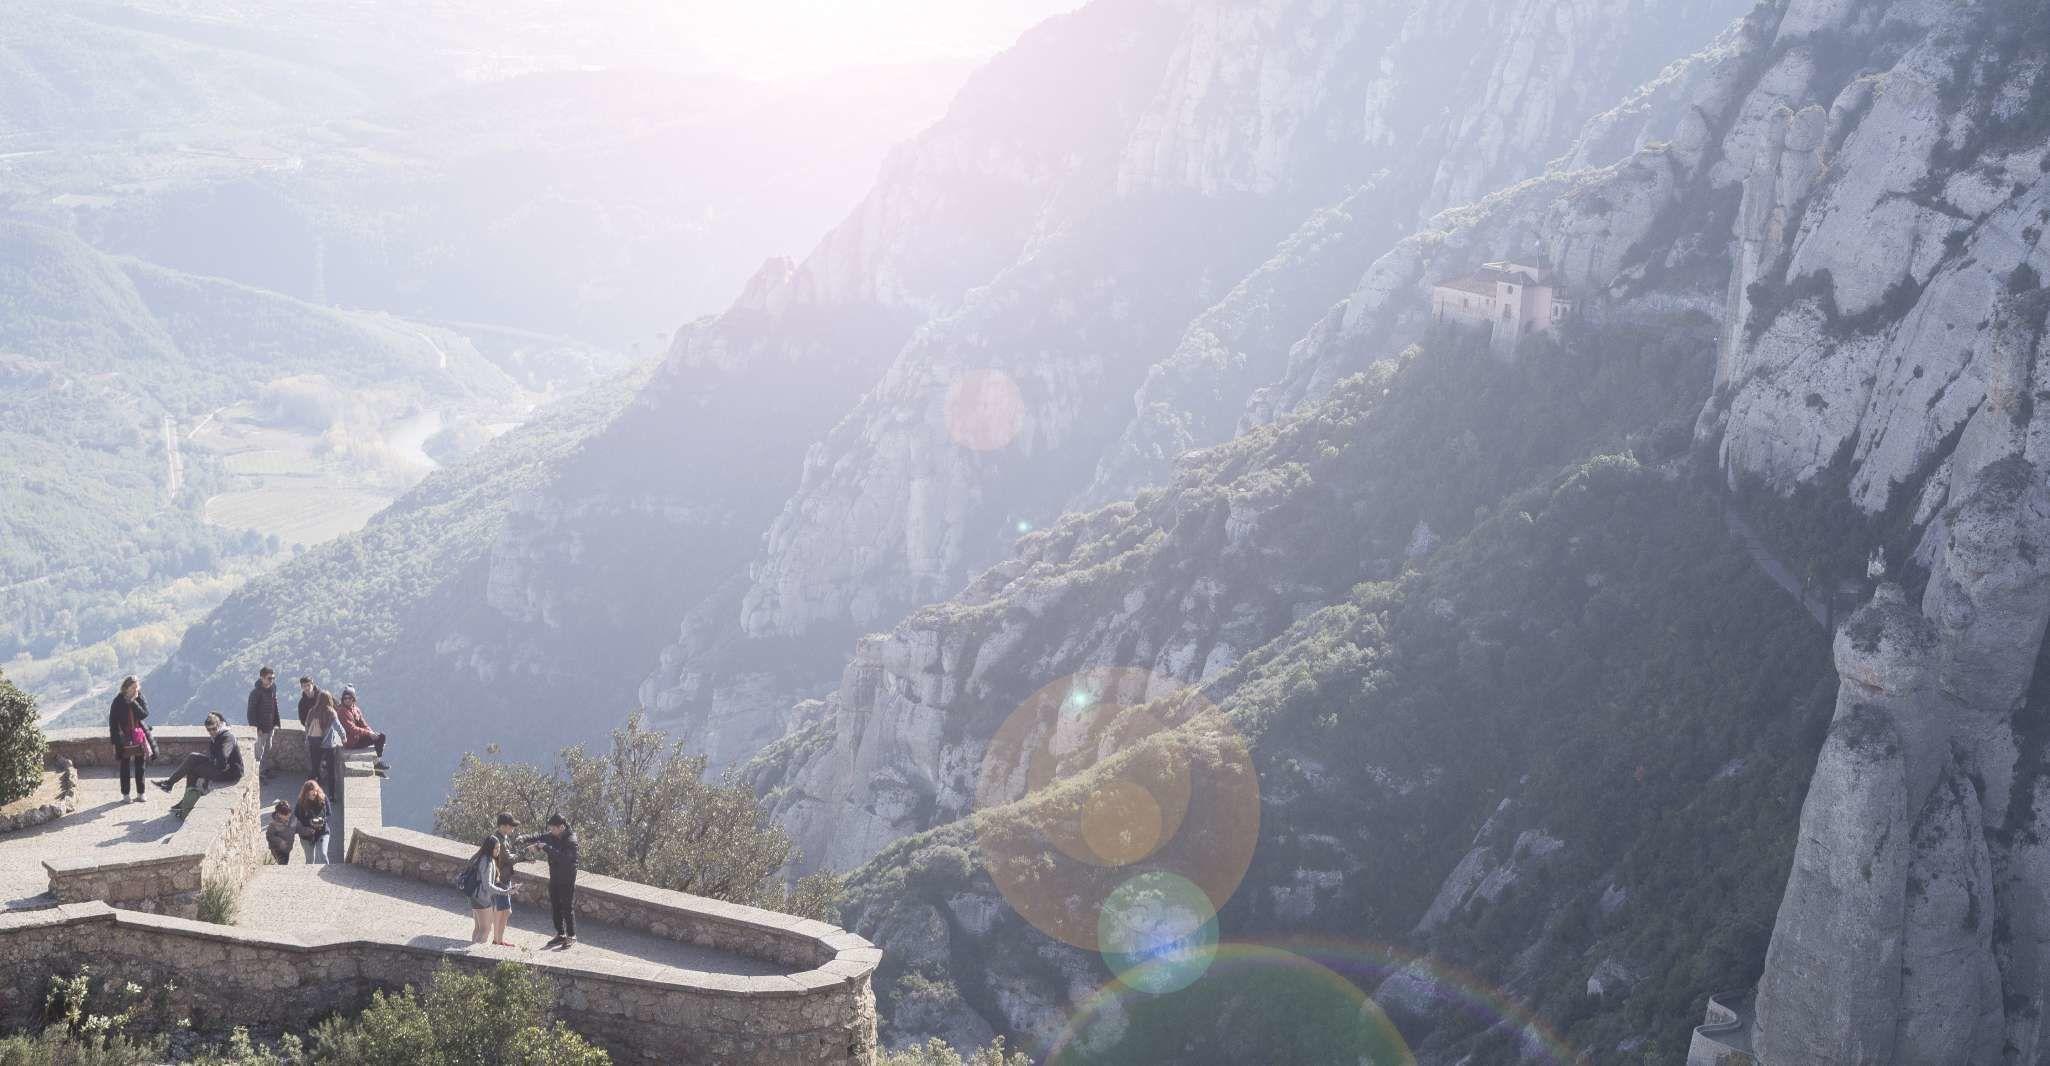 Barcelona Highlights City Tour and Montserrat Excursion